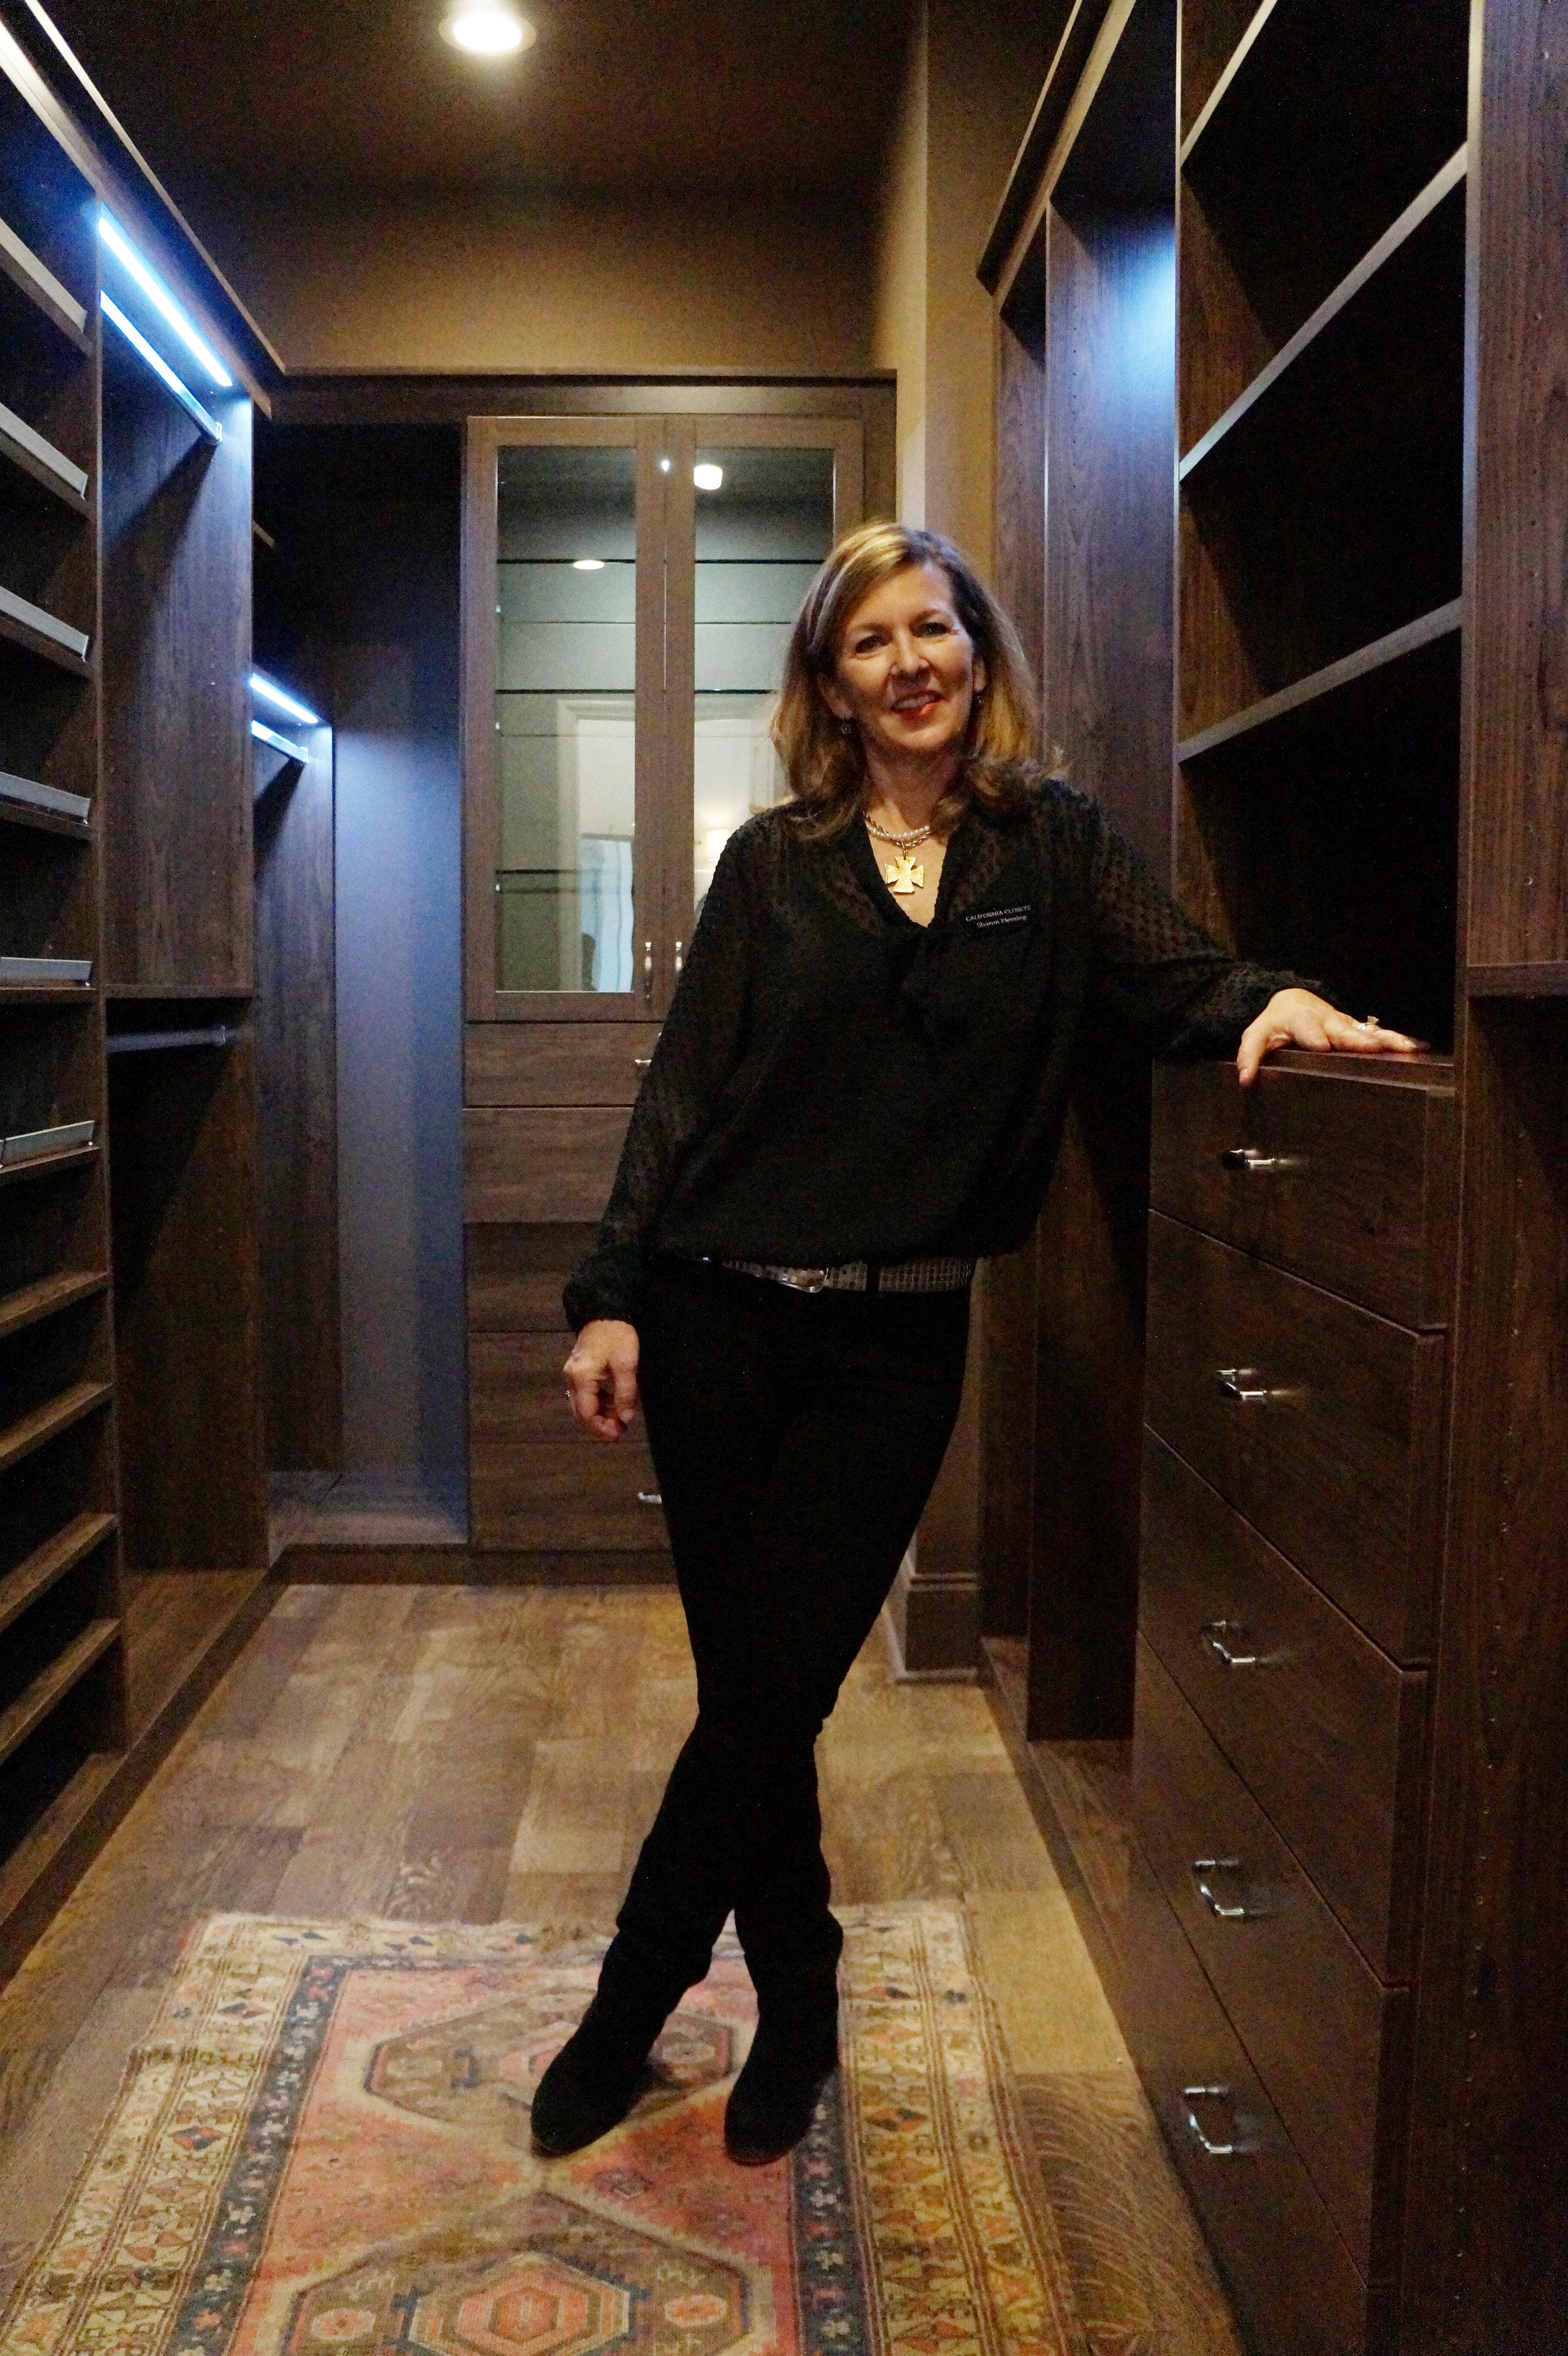 Andrea-Fenise-California-Closet-Vesta-Home-Show SC00865.JPG